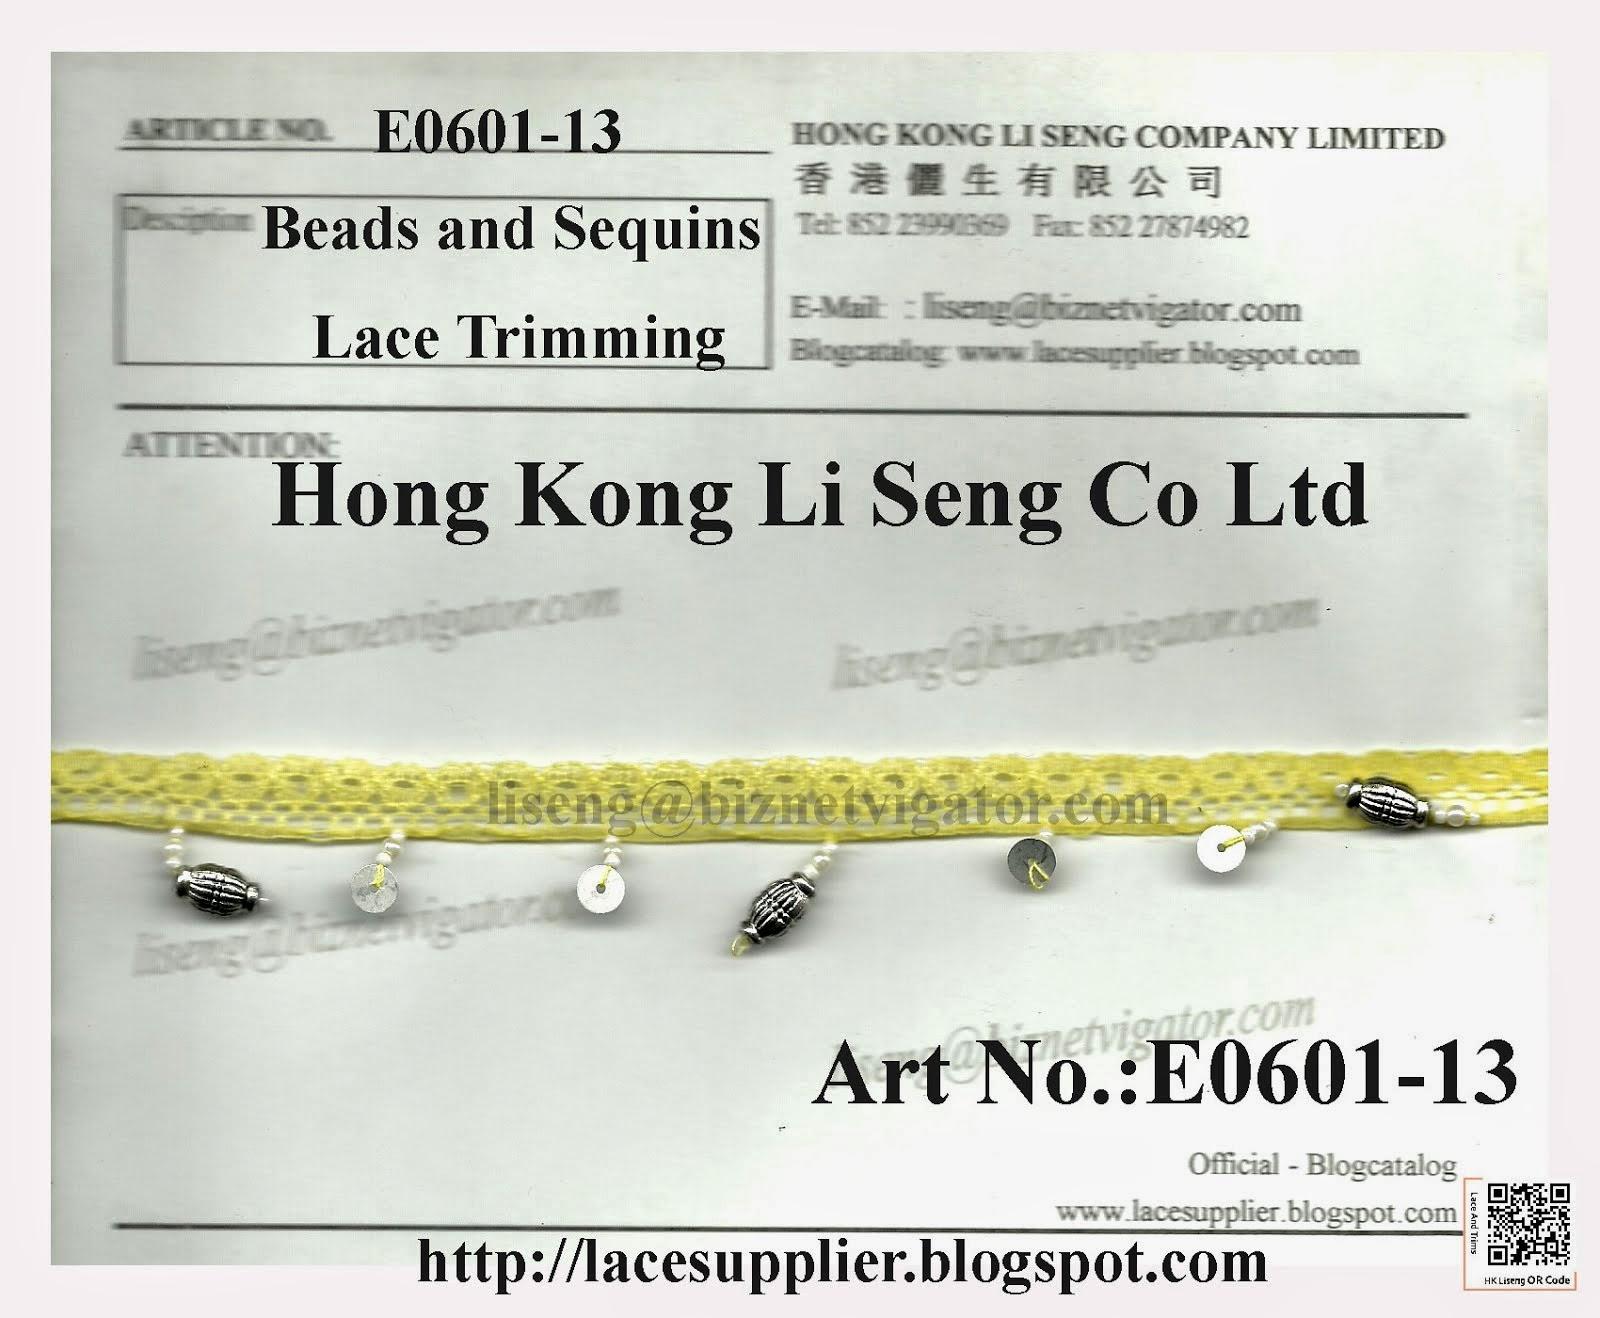 Beads and Sequins Lace Trimming Manufacturer - Hong Kong Li Seng Co Ltd